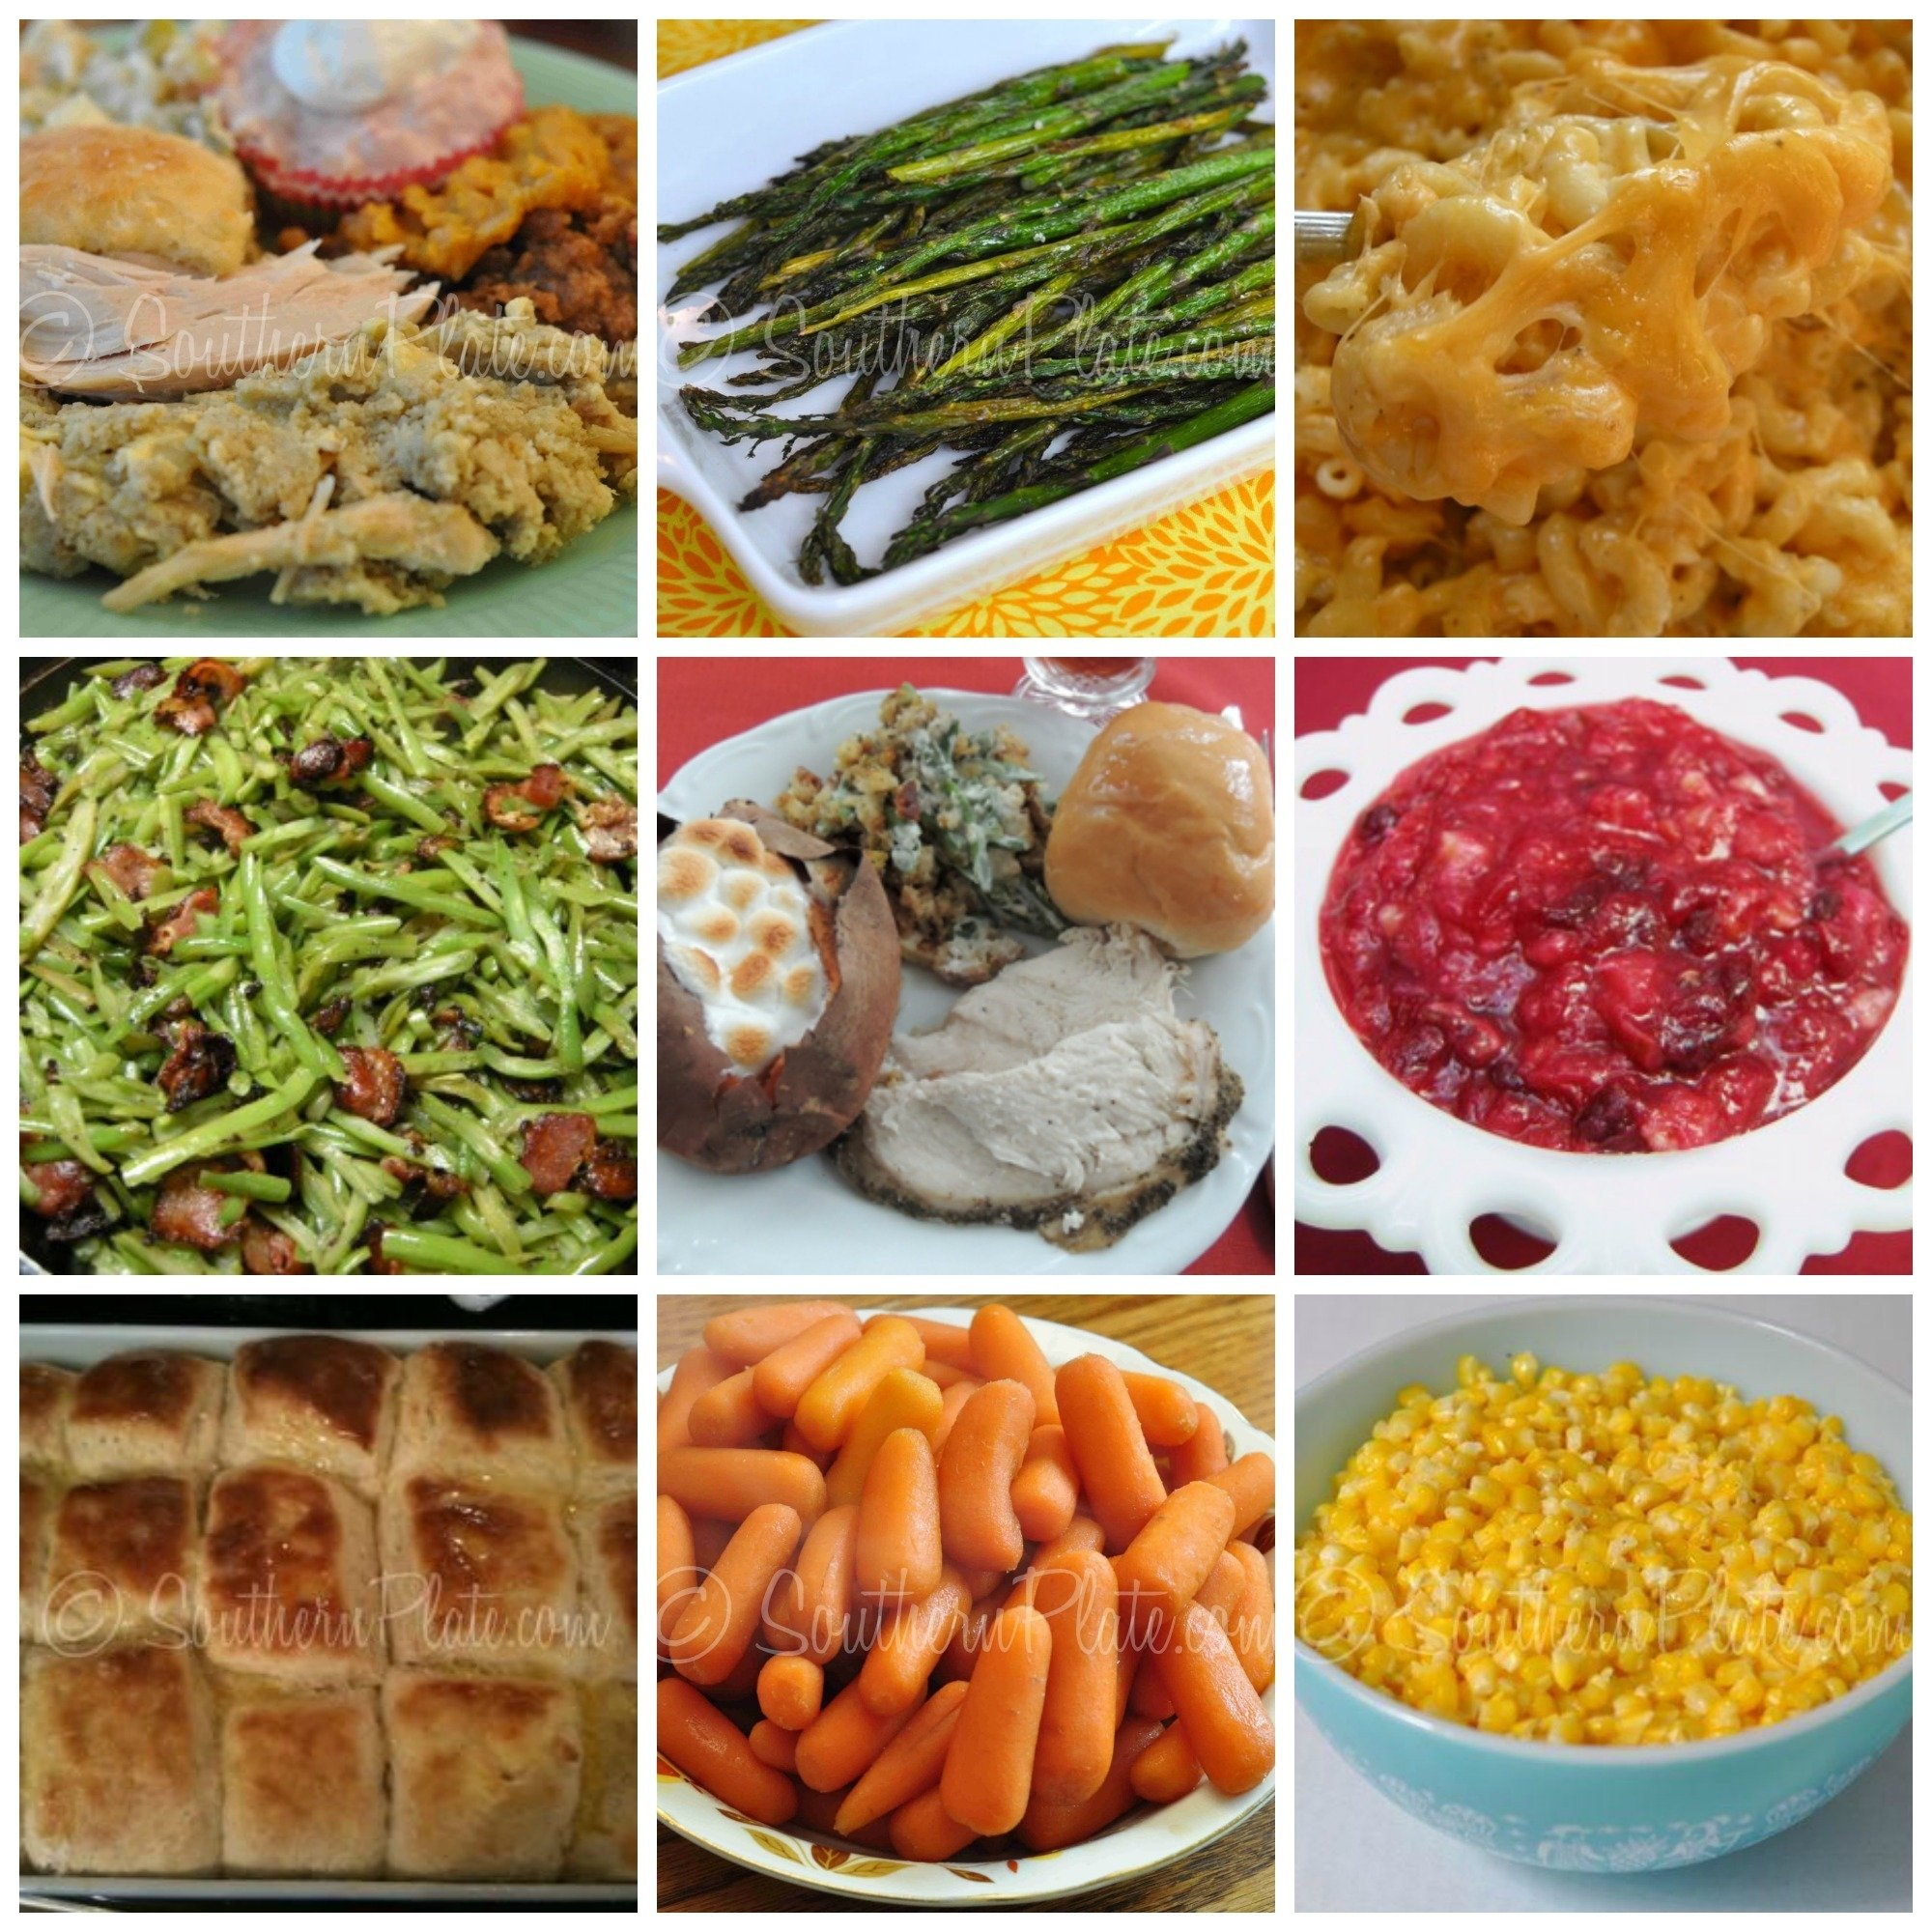 10 beautiful southern christmas dinner menu ideas 10 beautiful southern christmas dinner menu ideas holiday menu bonanza with time saving tips 70 recipes forumfinder Choice Image